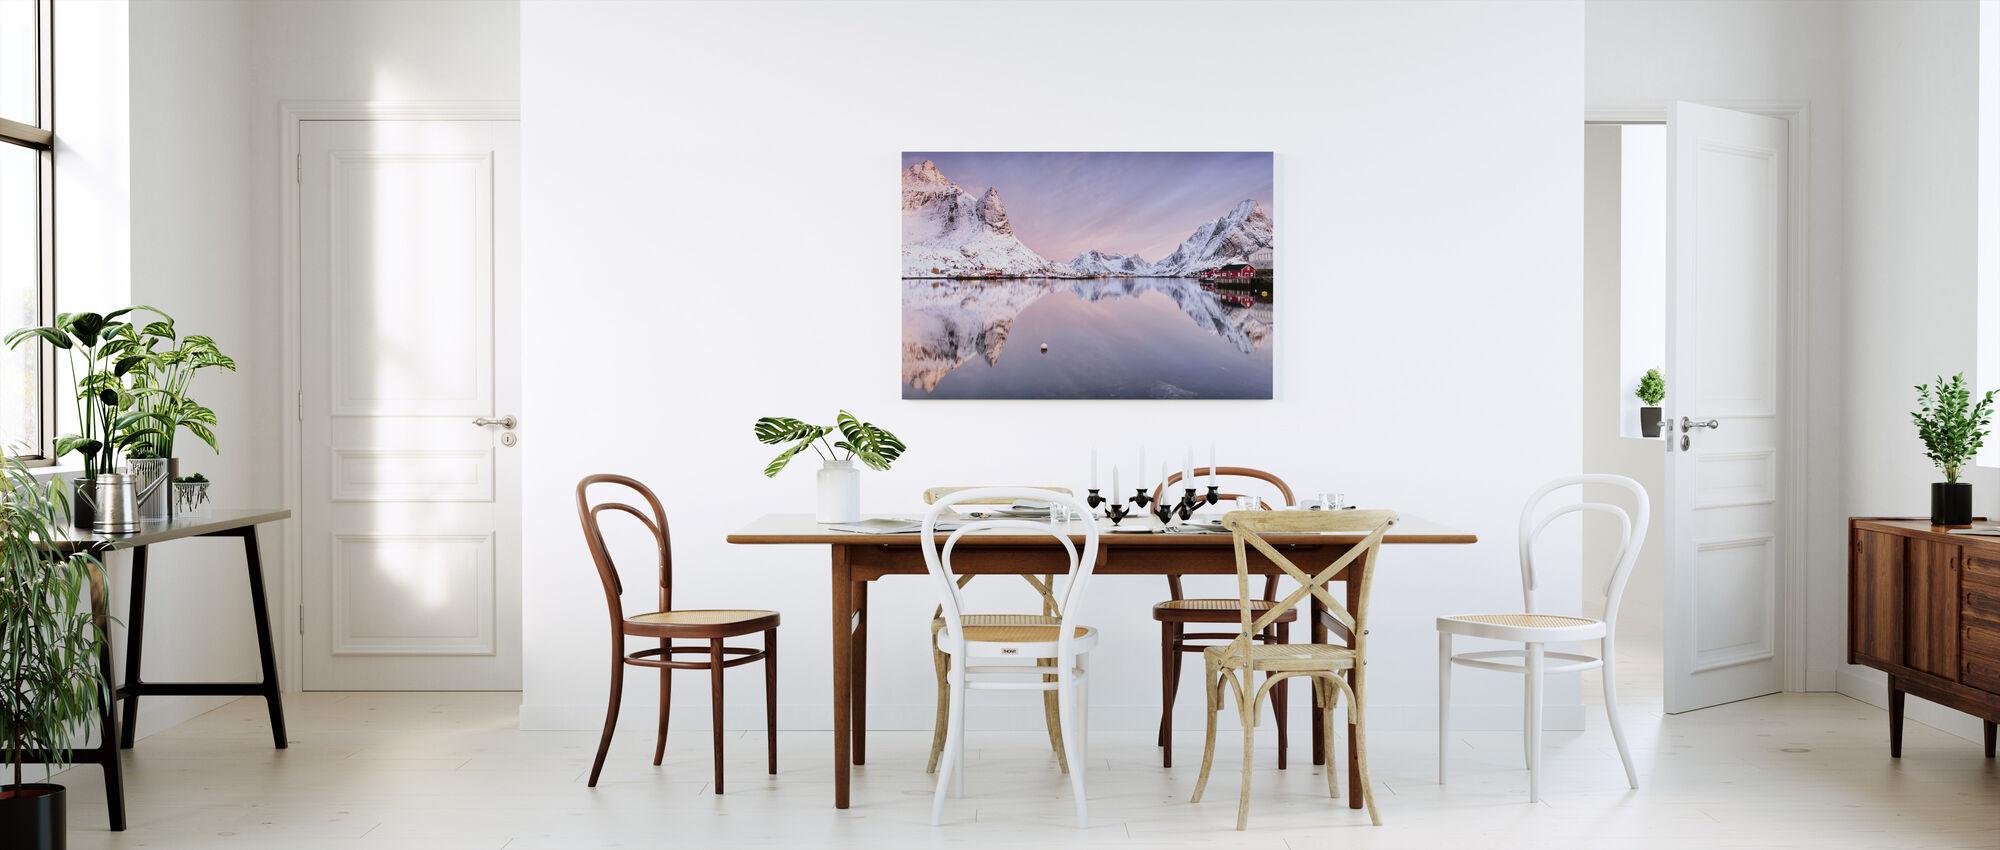 Sunrise at the Fjord - Canvas print - Kitchen